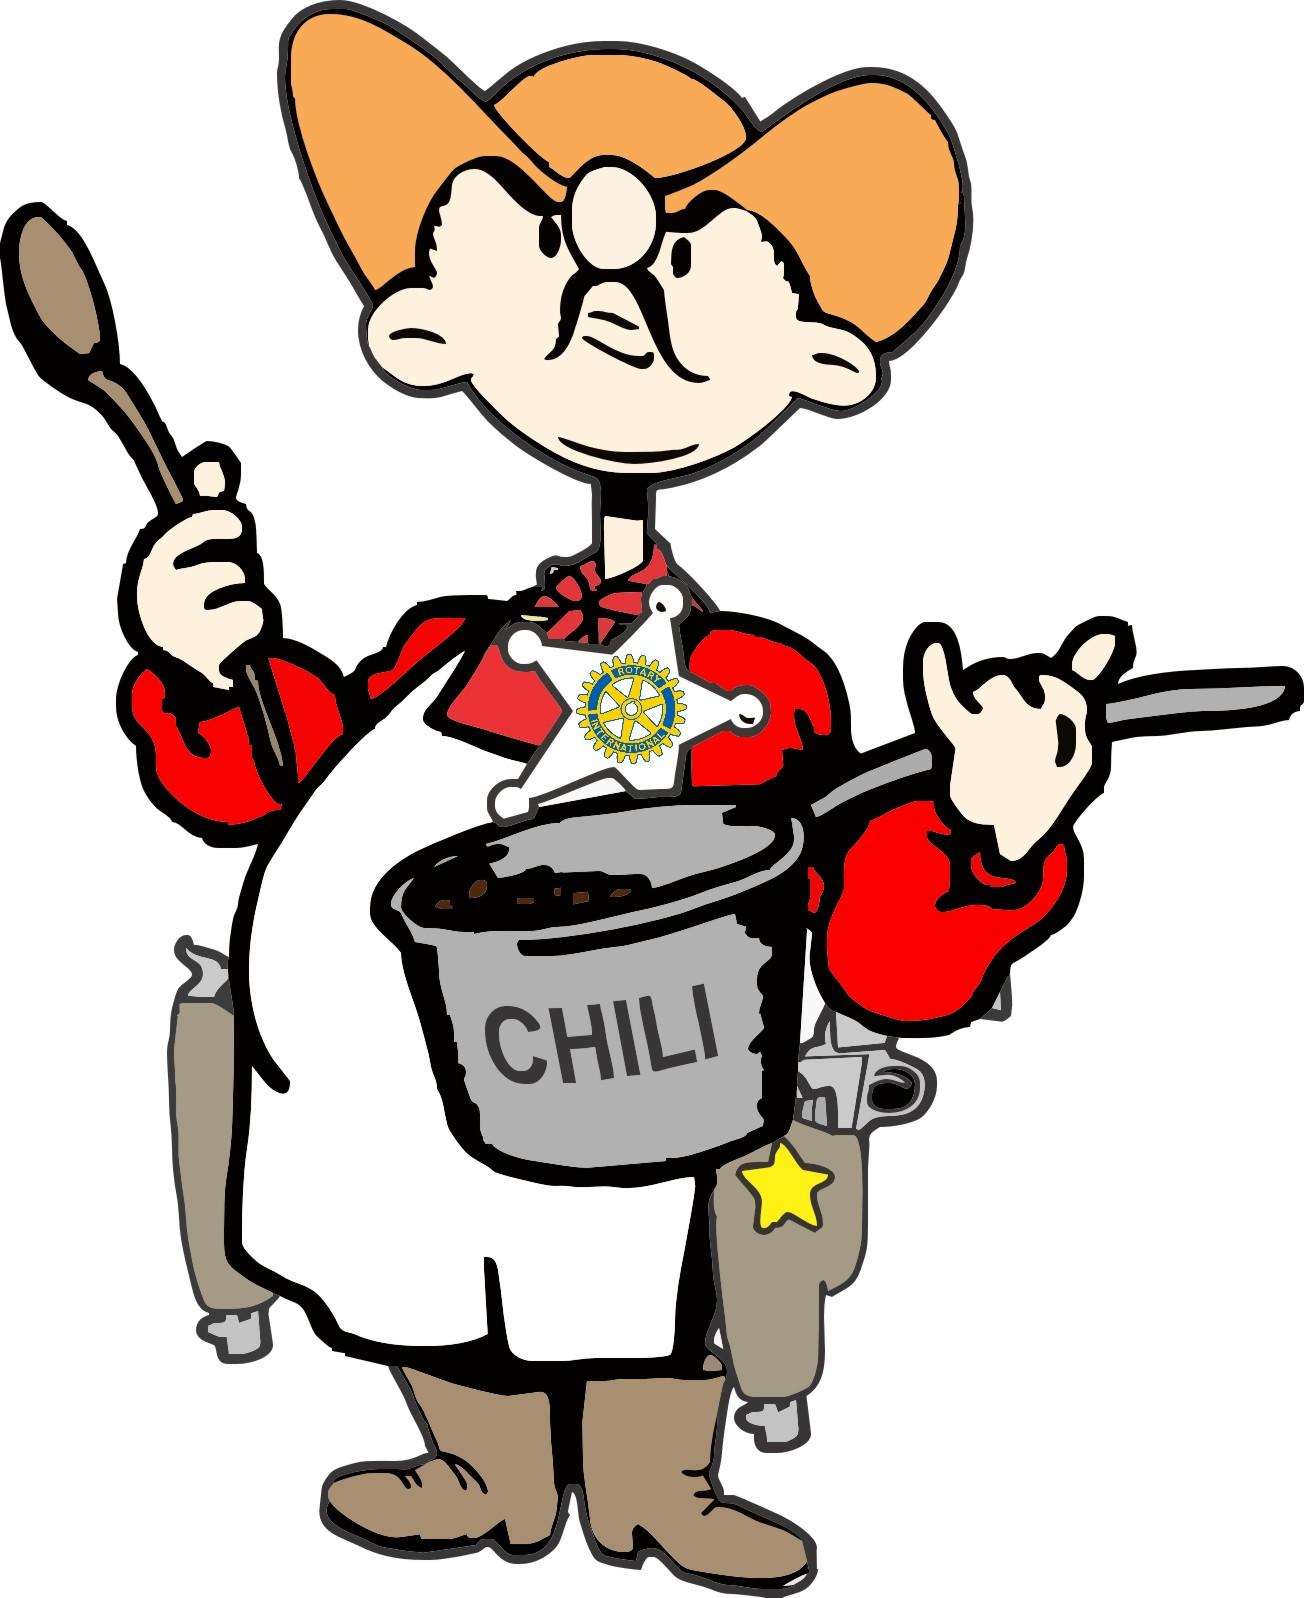 Chili Cook Off Clipart & Chili Cook Off Clip Art Images.